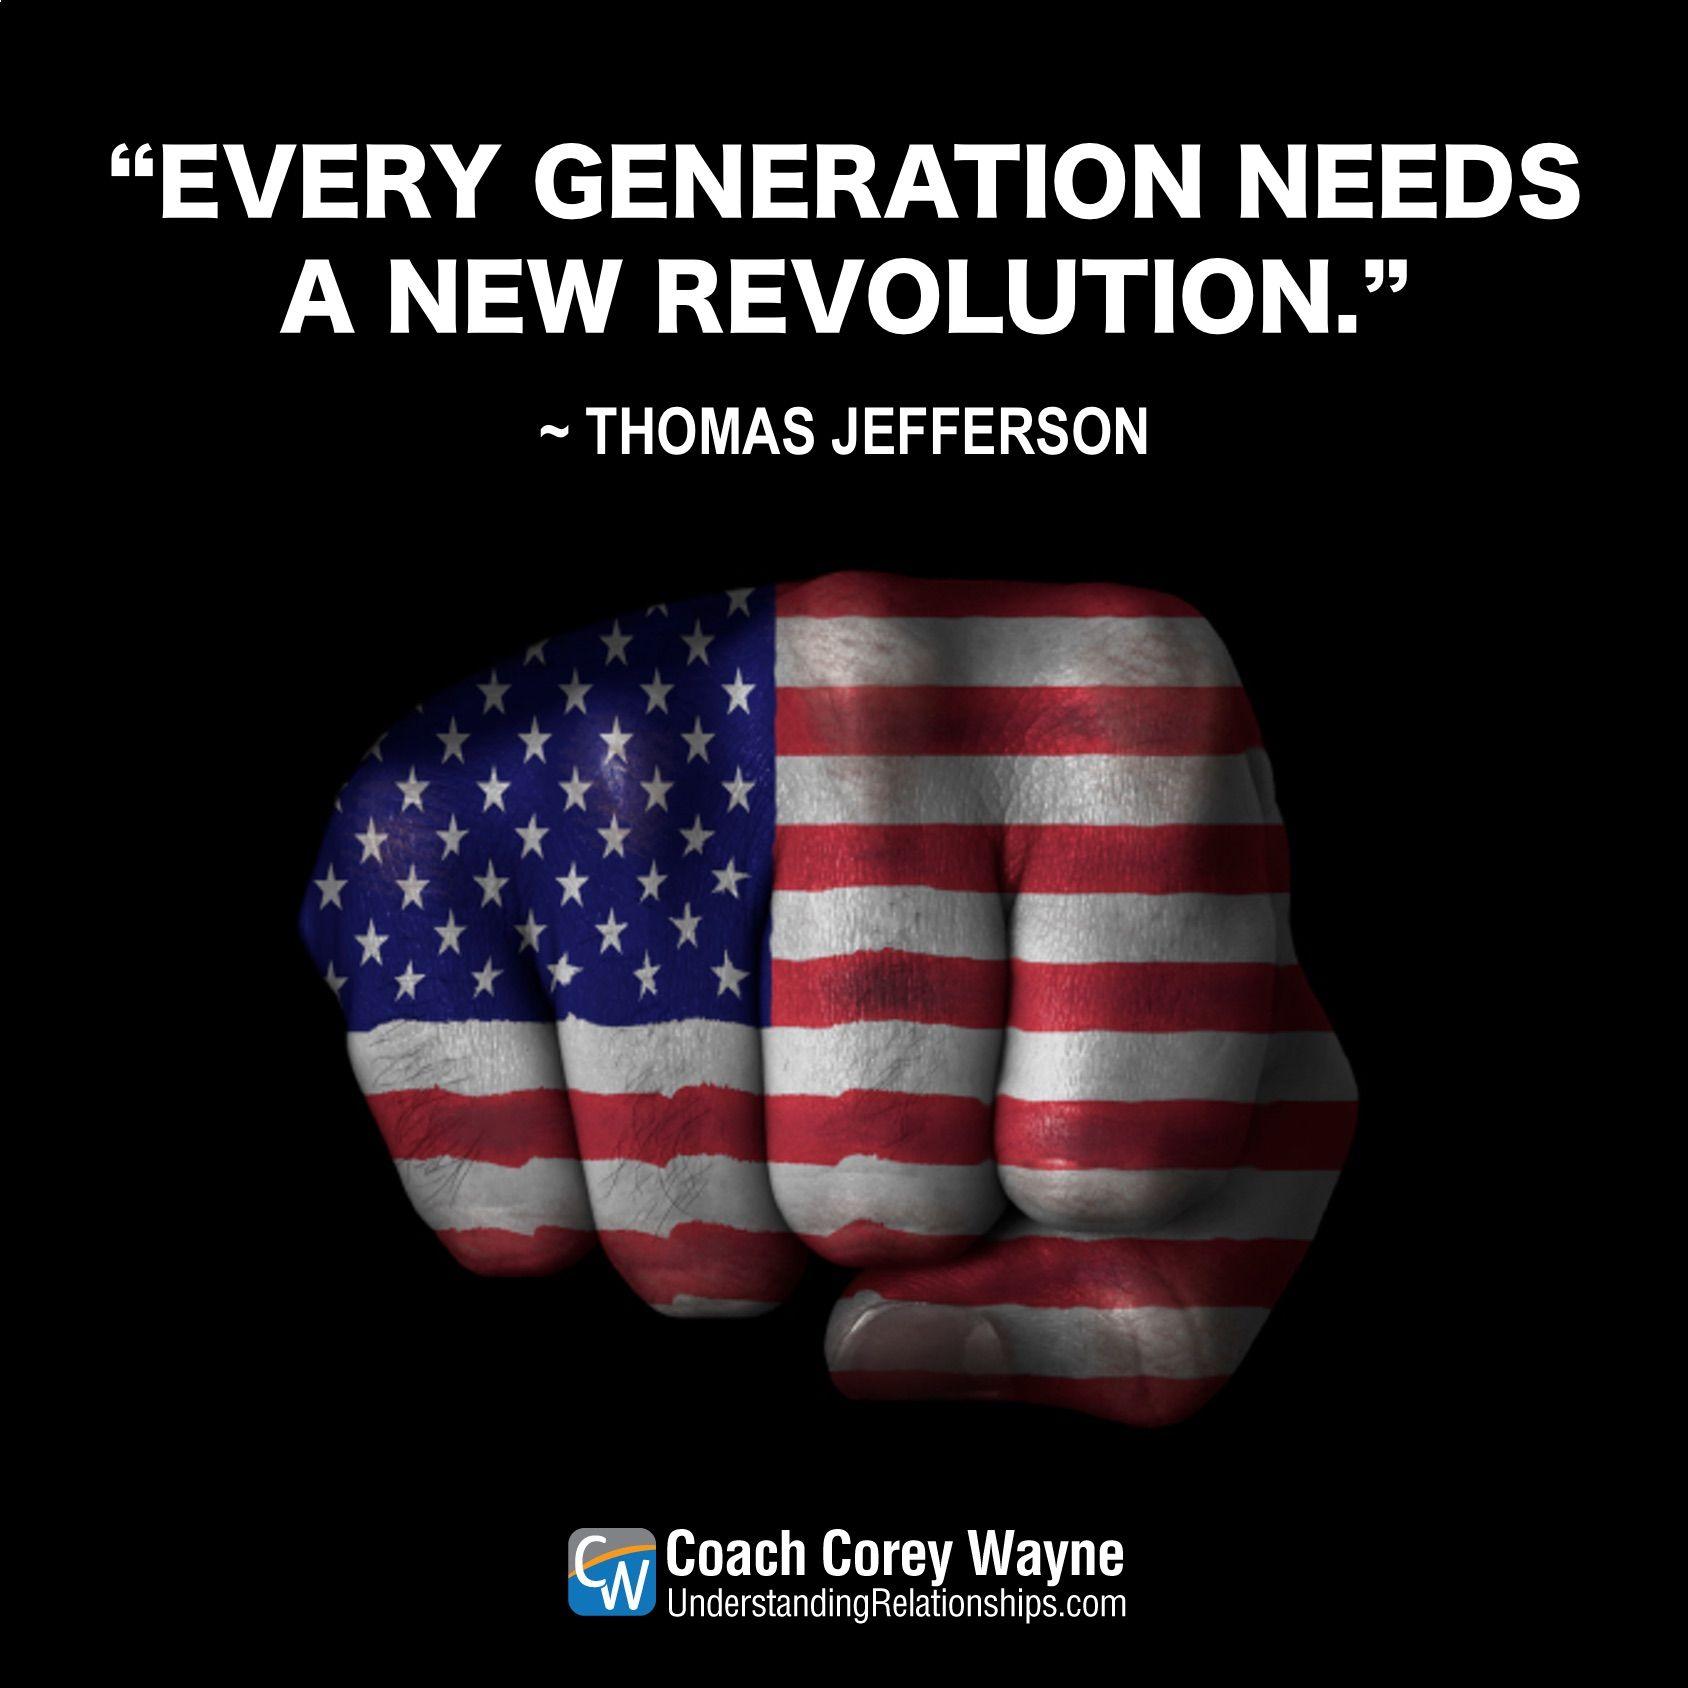 Thomasjefferson Foundingfathers Patriot America Unitedstates Americanquotes Americanrevolution Freedom American President Government Constitution